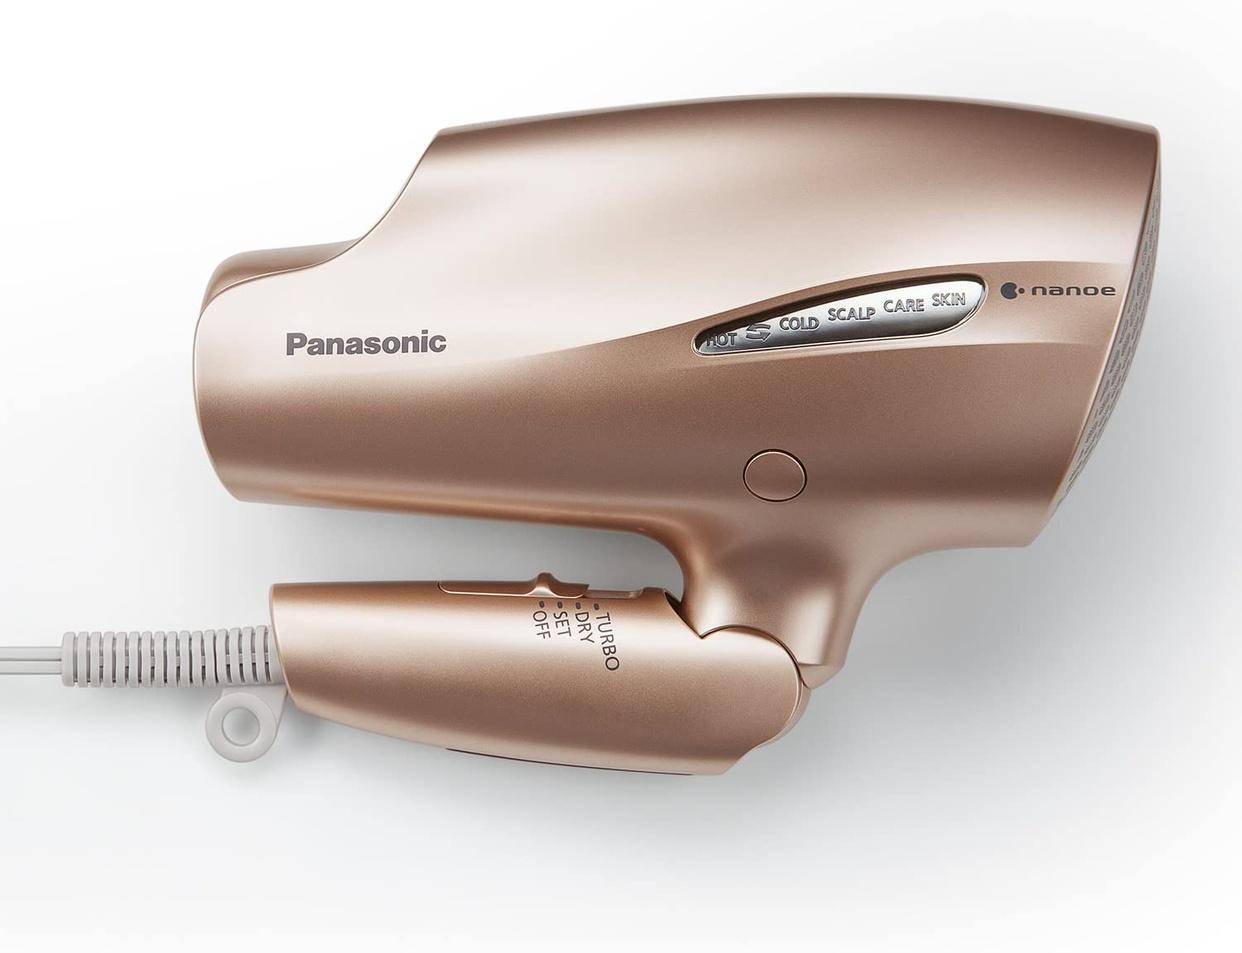 Panasonic(パナソニック) ヘアー ドライヤー ナノケア EH-NA99の商品画像4